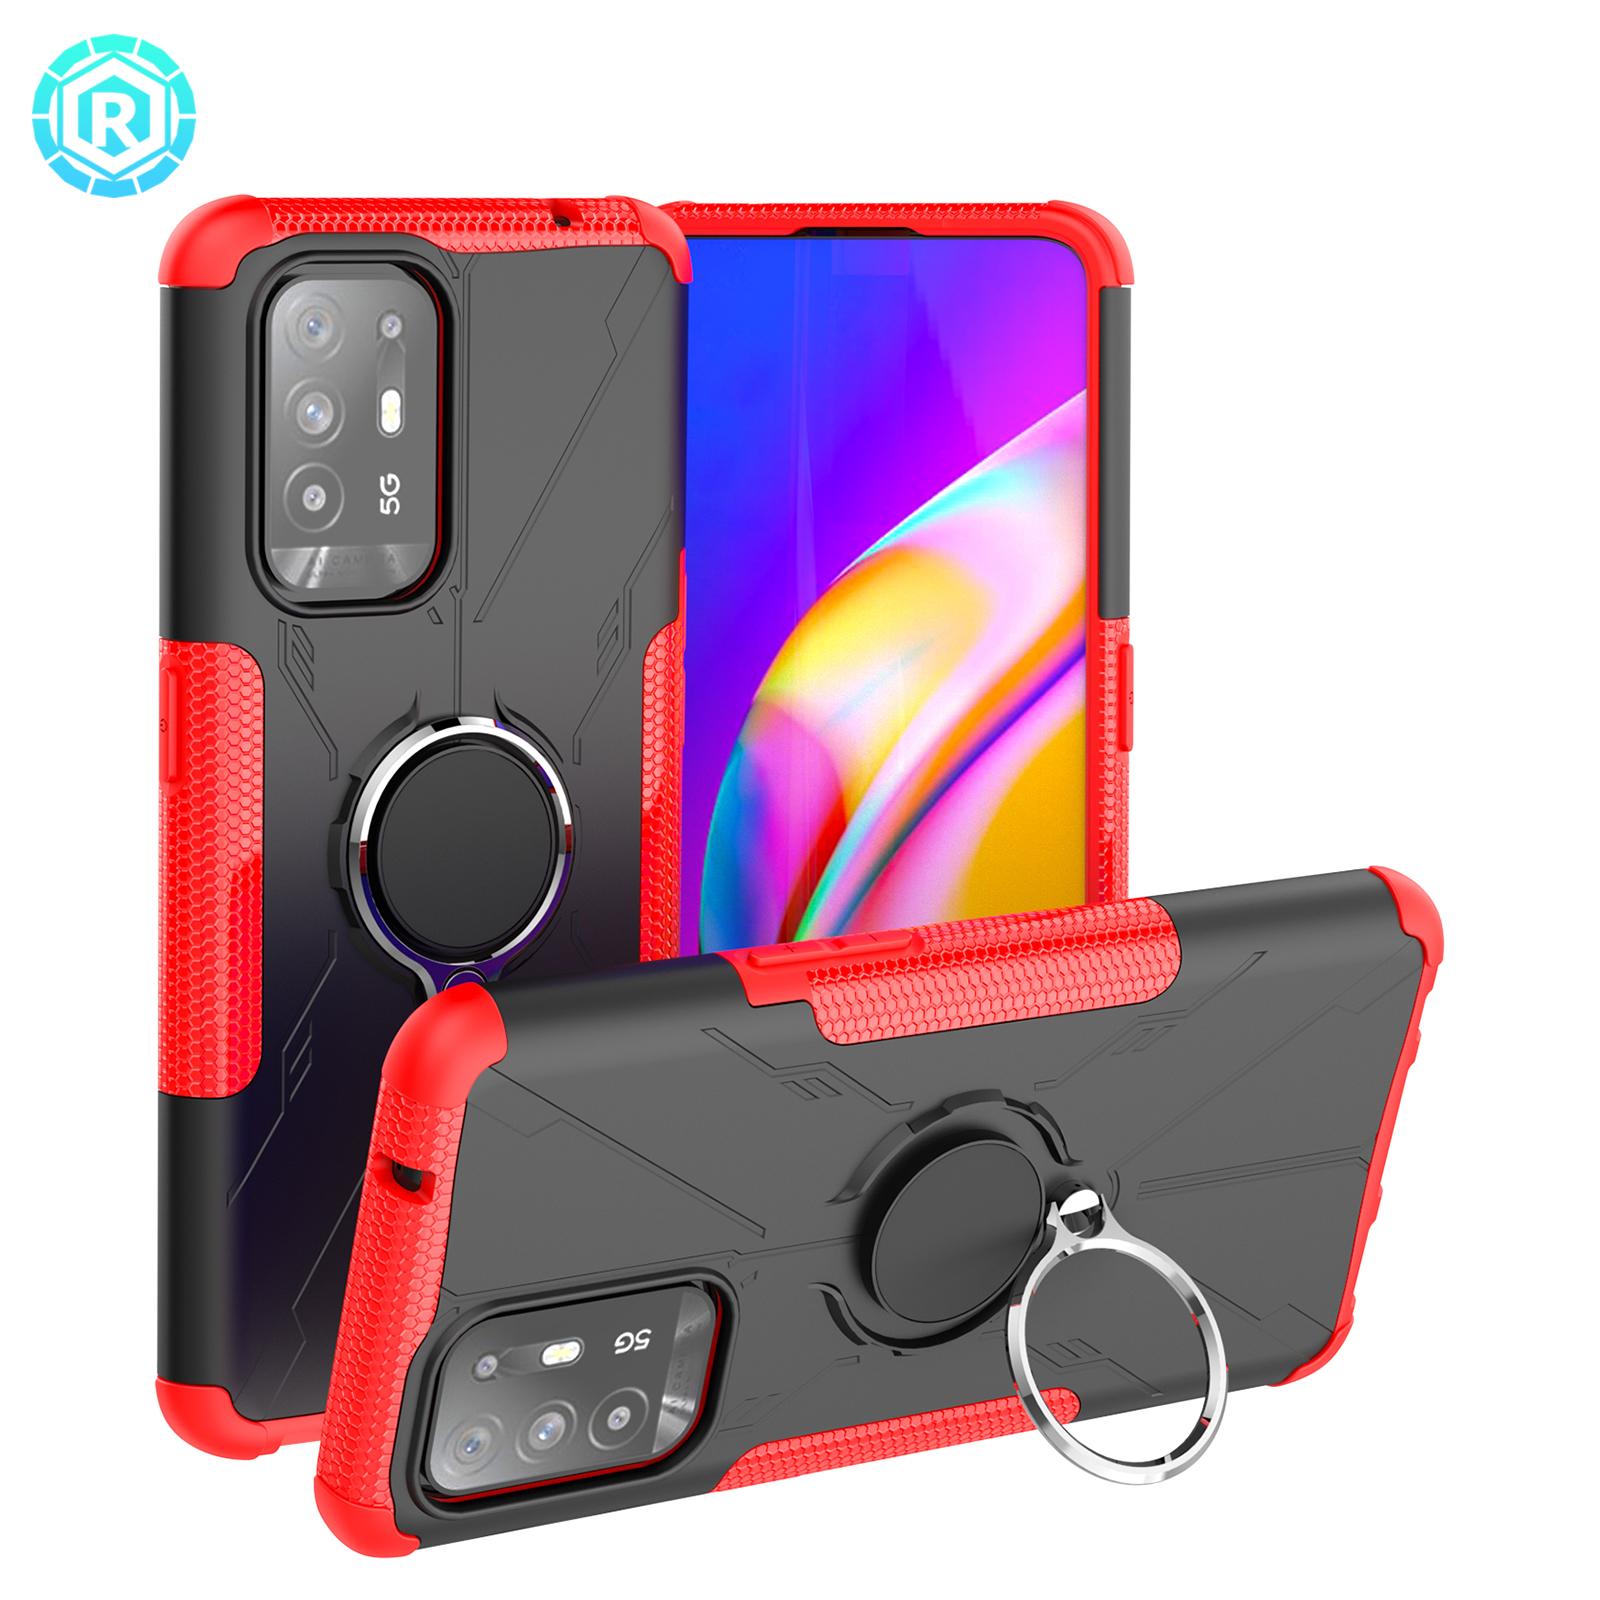 Mecha Phone Case For OPPO F19 Pro Plus